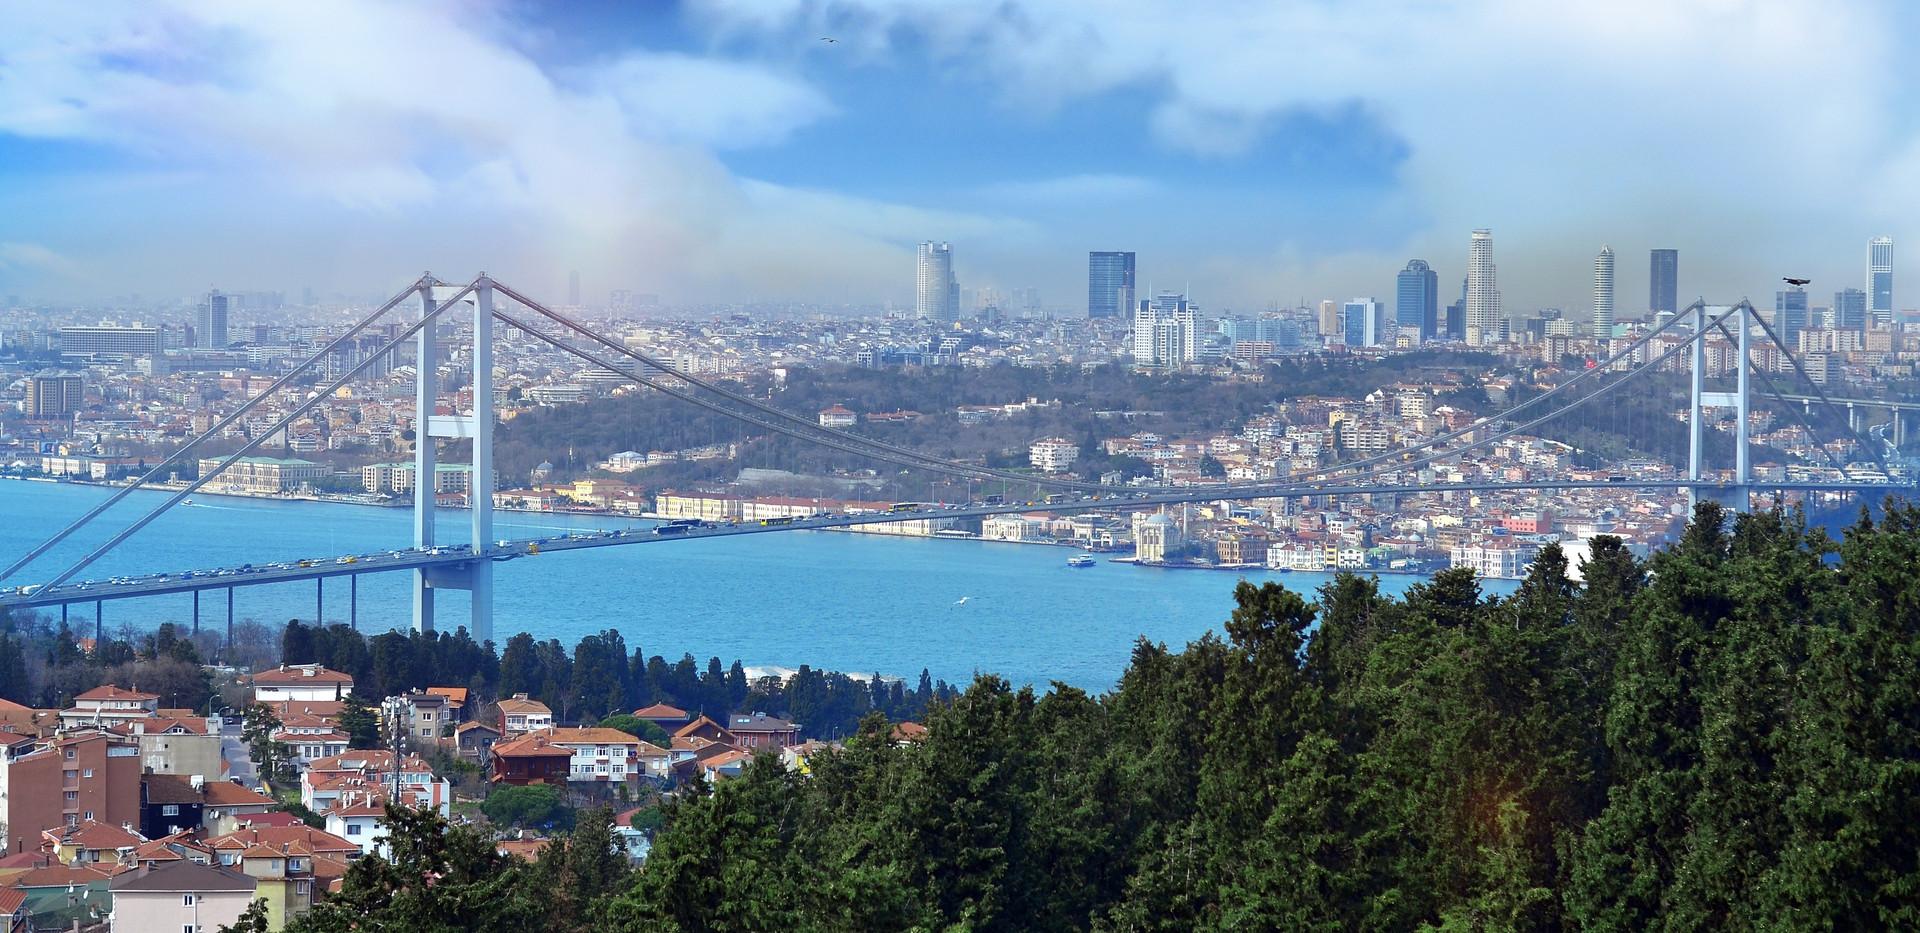 Estambul - Boğaz